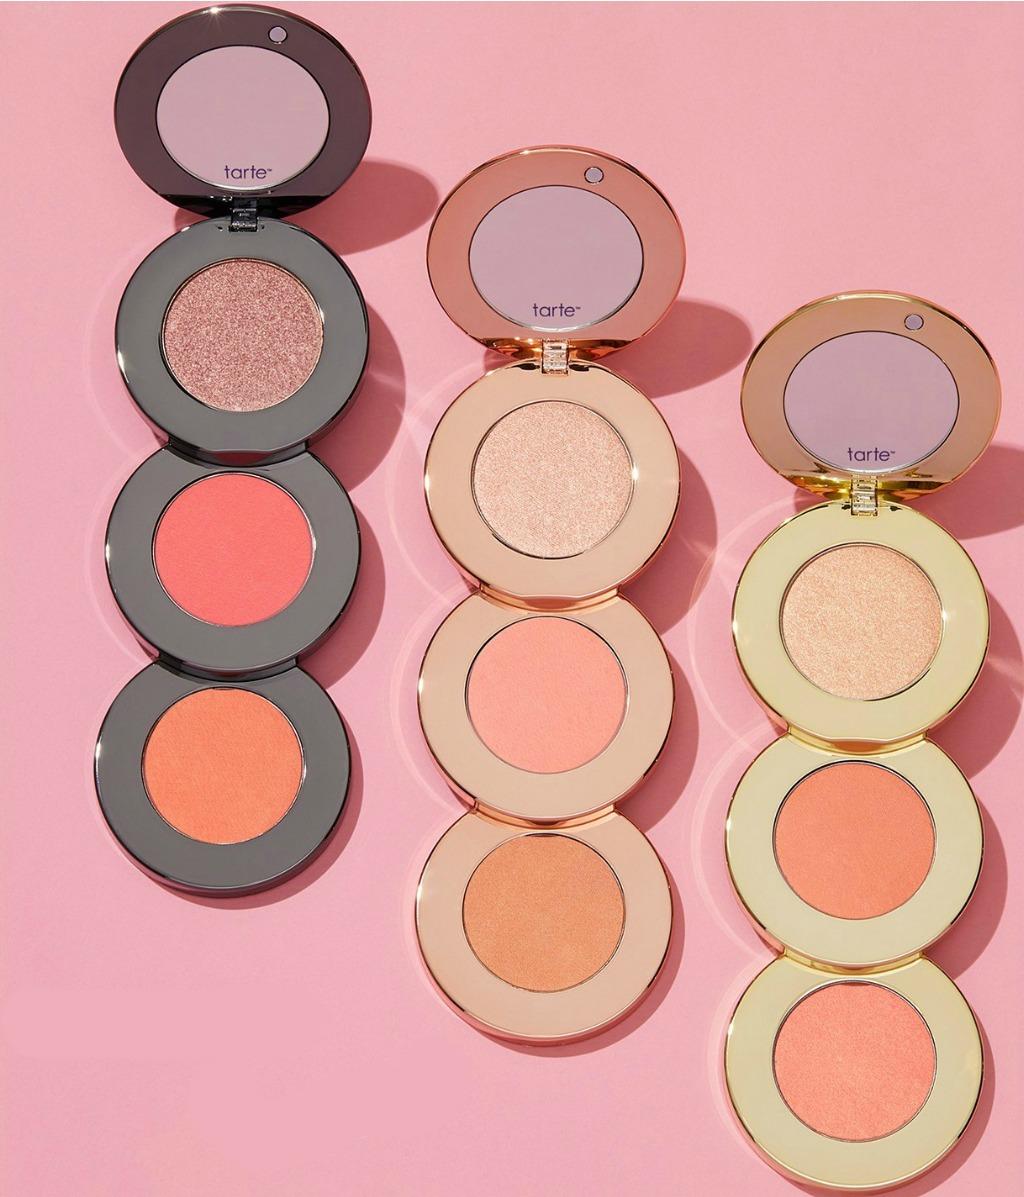 Tarte Cosmetics 9-piece Blush Set